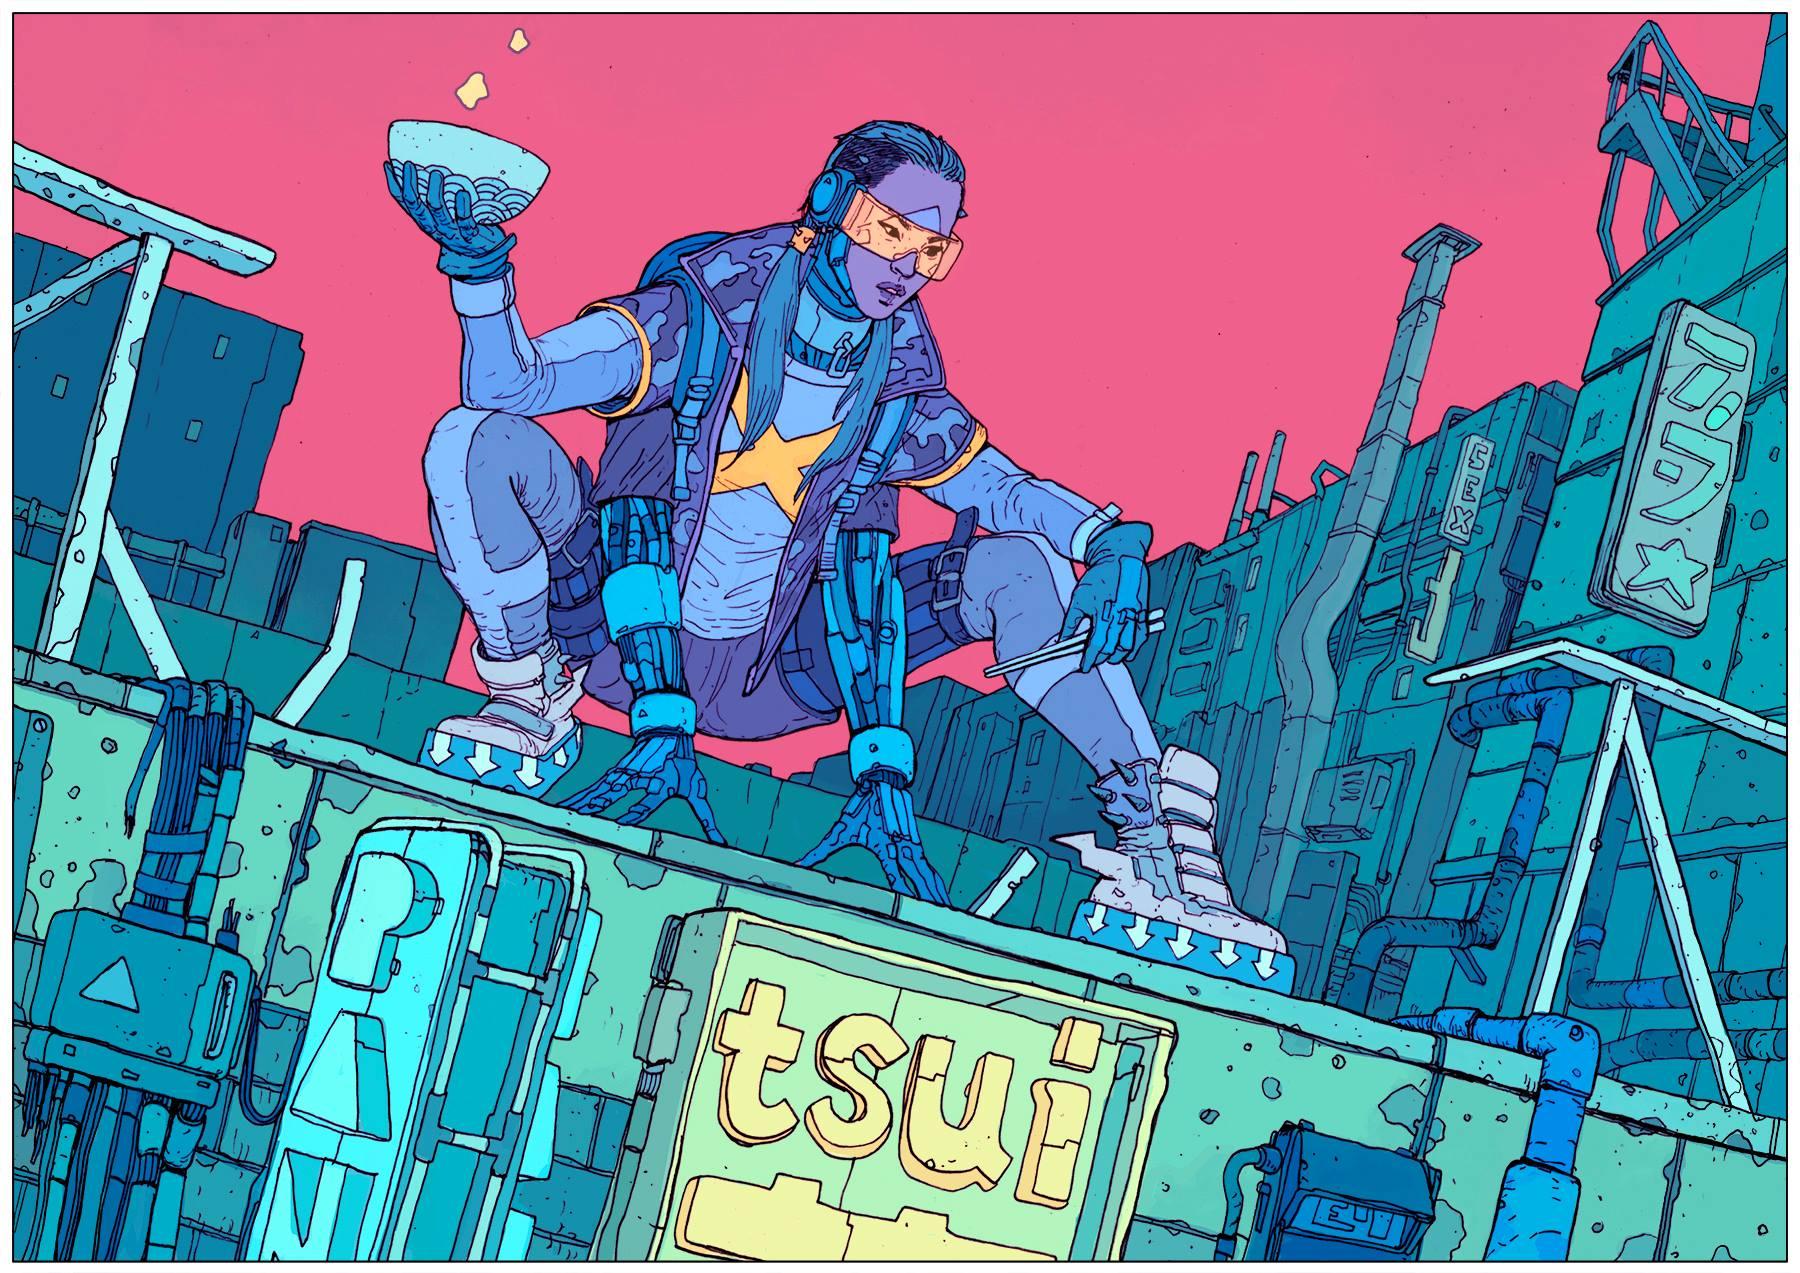 SCI Fi Cyberpunk Ilustração 11 - Josan Gonzalez